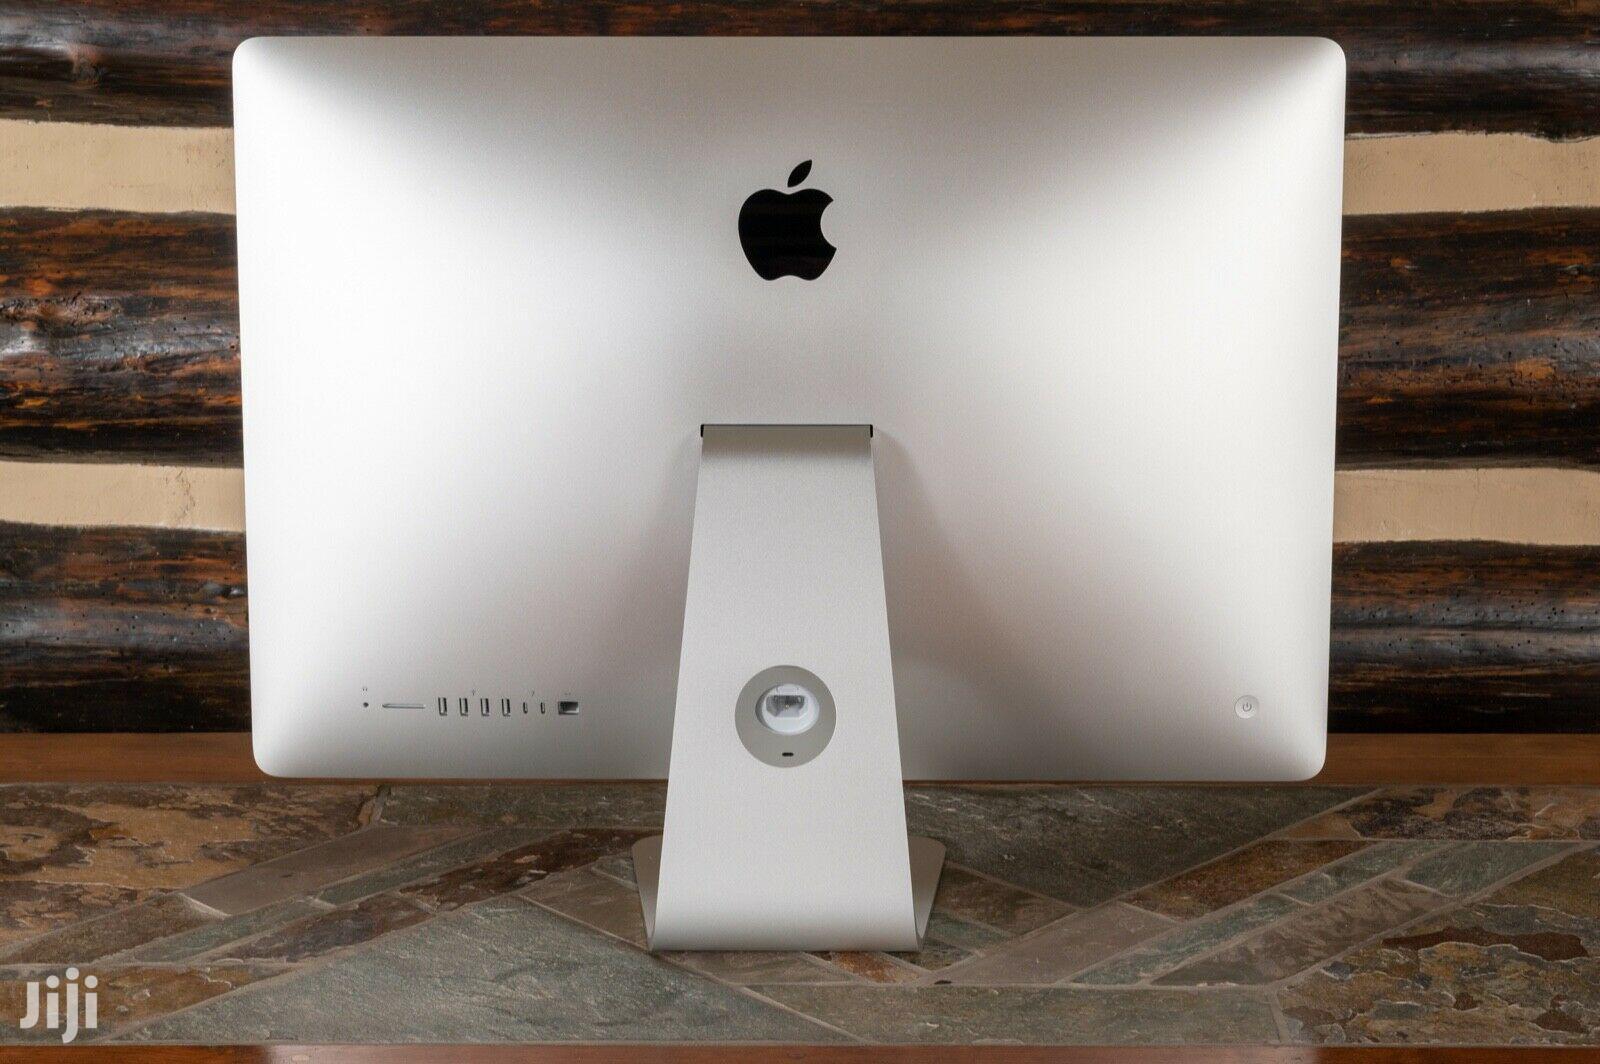 New Desktop Computer Apple iMac Pro 32GB Intel Core i9 SSD 2T | Laptops & Computers for sale in Dansoman, Greater Accra, Ghana